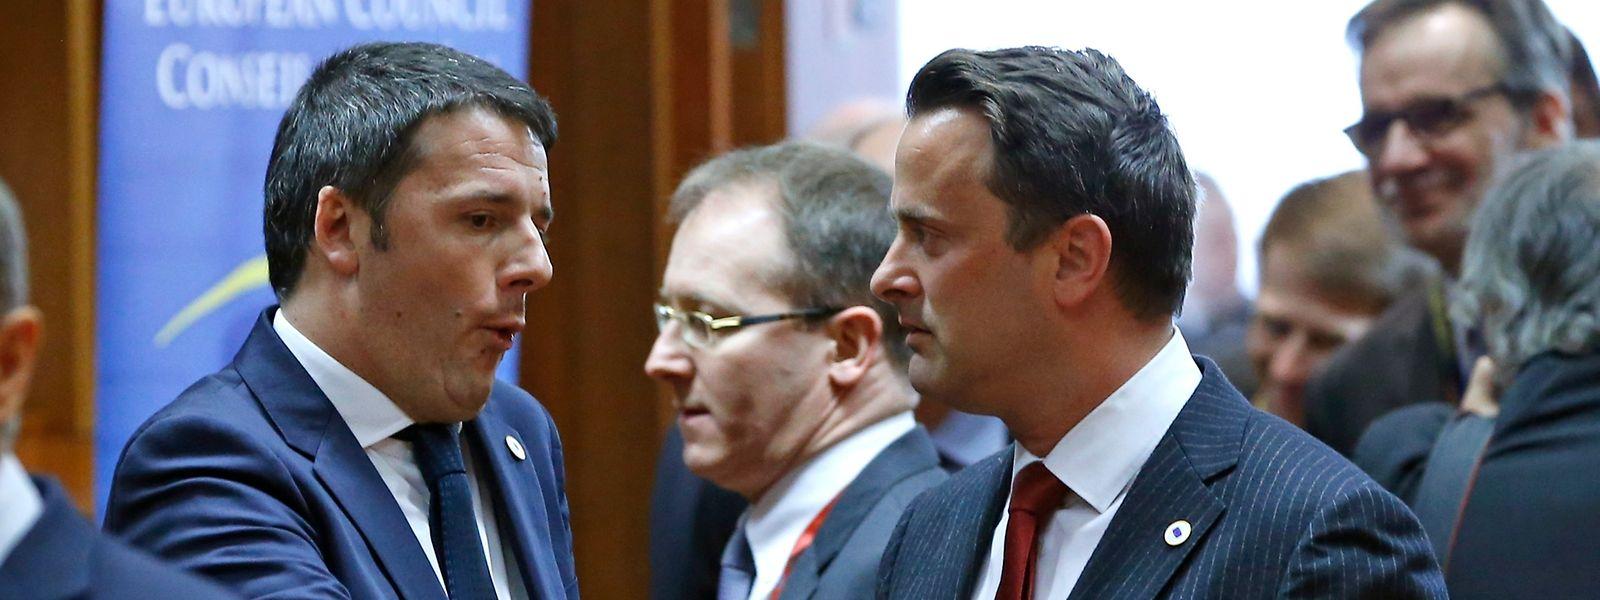 Matteo Renzi, ici en compagnie de son homologue Xavier Bettel lors d'un sommet européen.